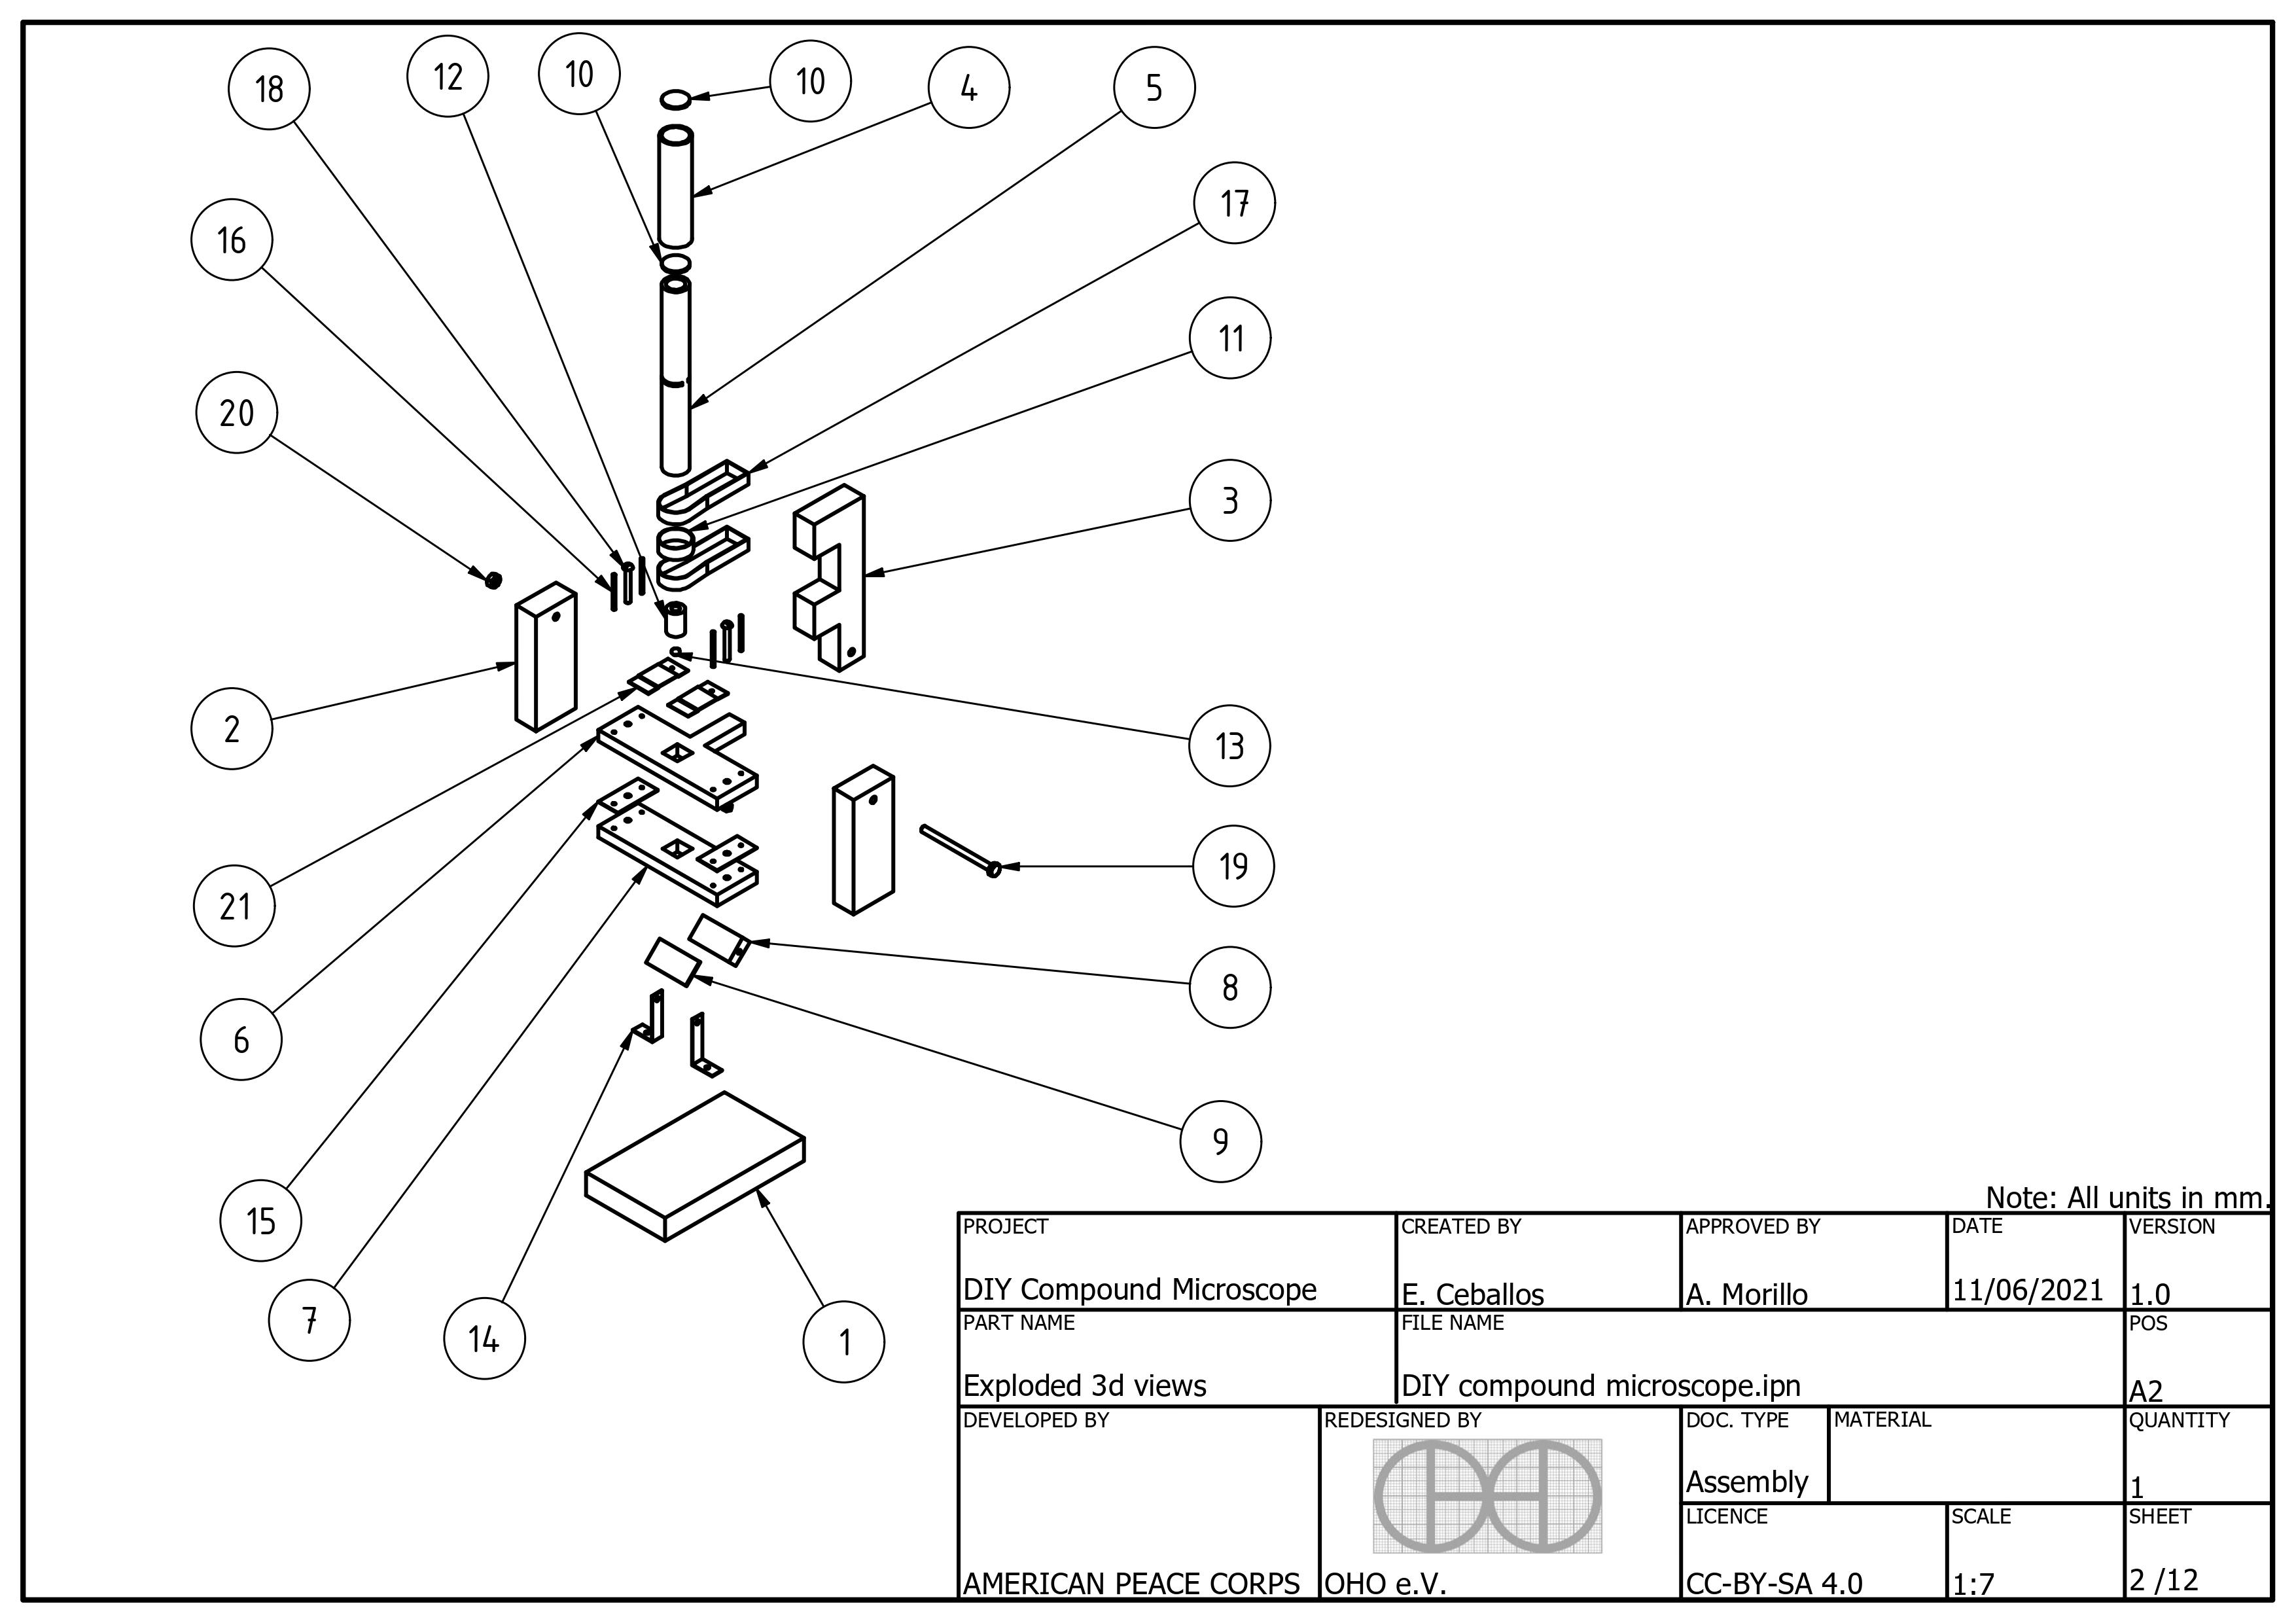 Oho apc dcm-DIY-compound-microscope 0002.jpg